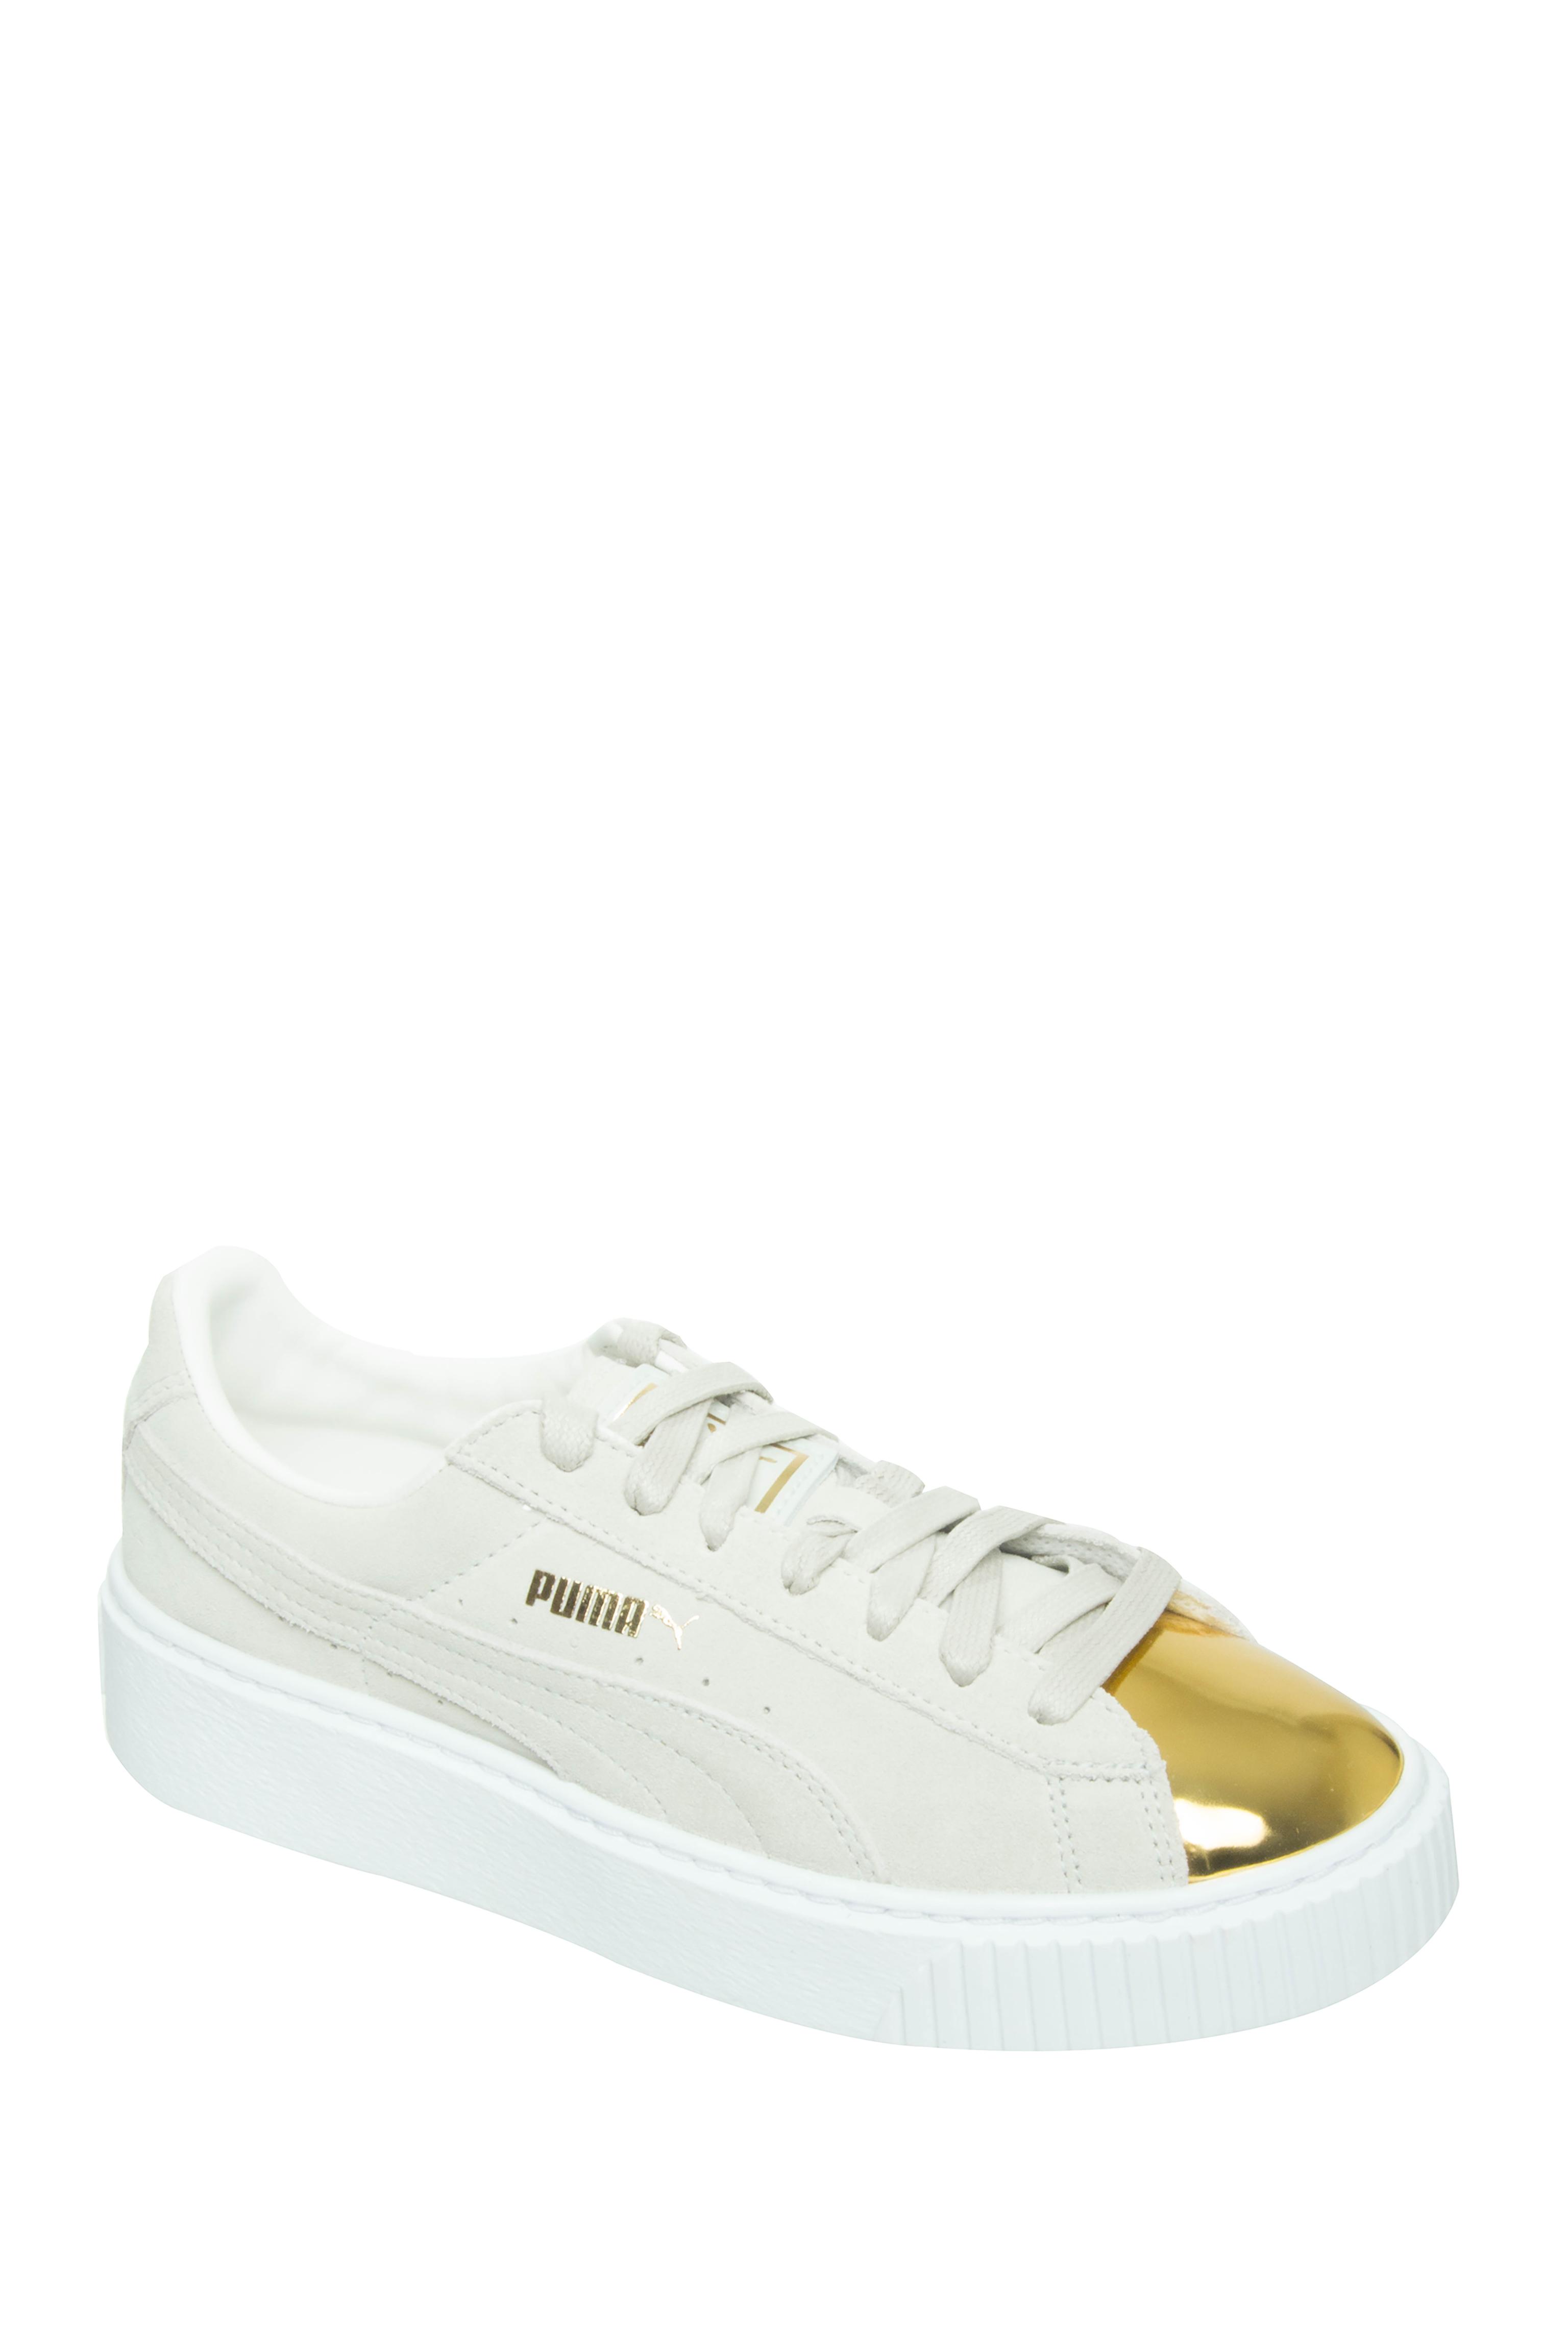 Puma Goldtoe Suede Platform Sneakers - White